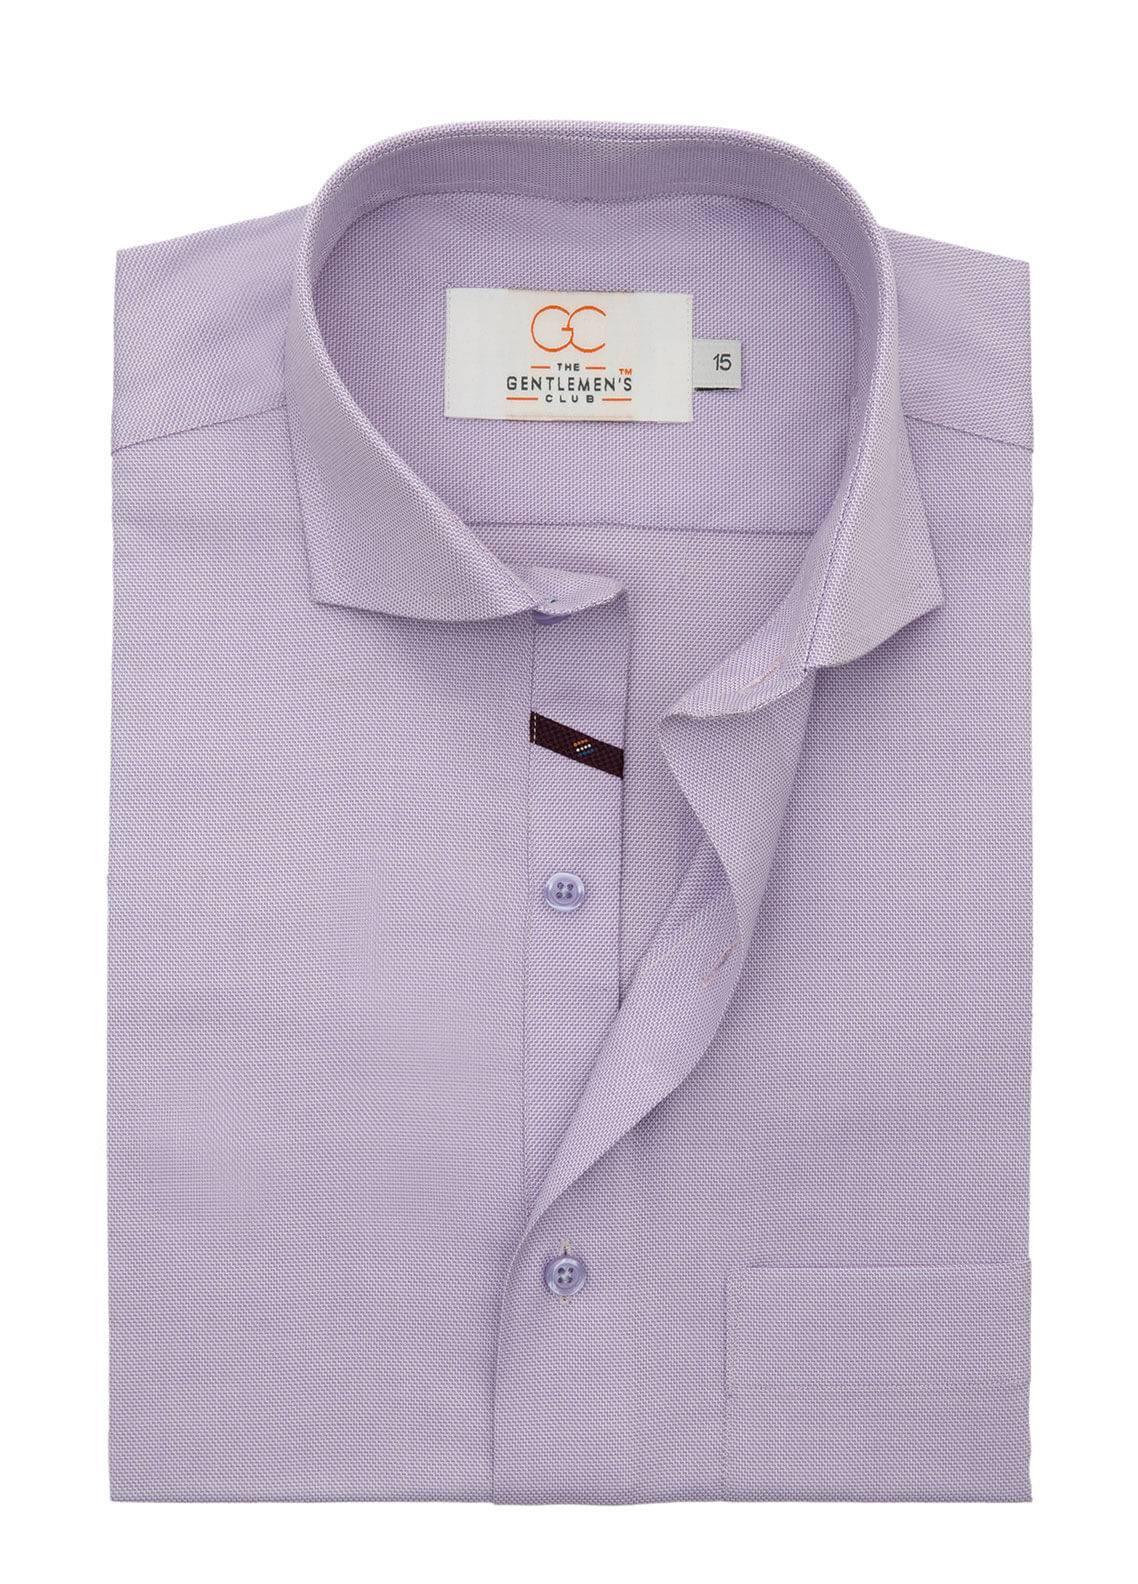 The Gentlemen's Club Cotton Formal Men Shirts - Purple White Label 4077 - 18.5